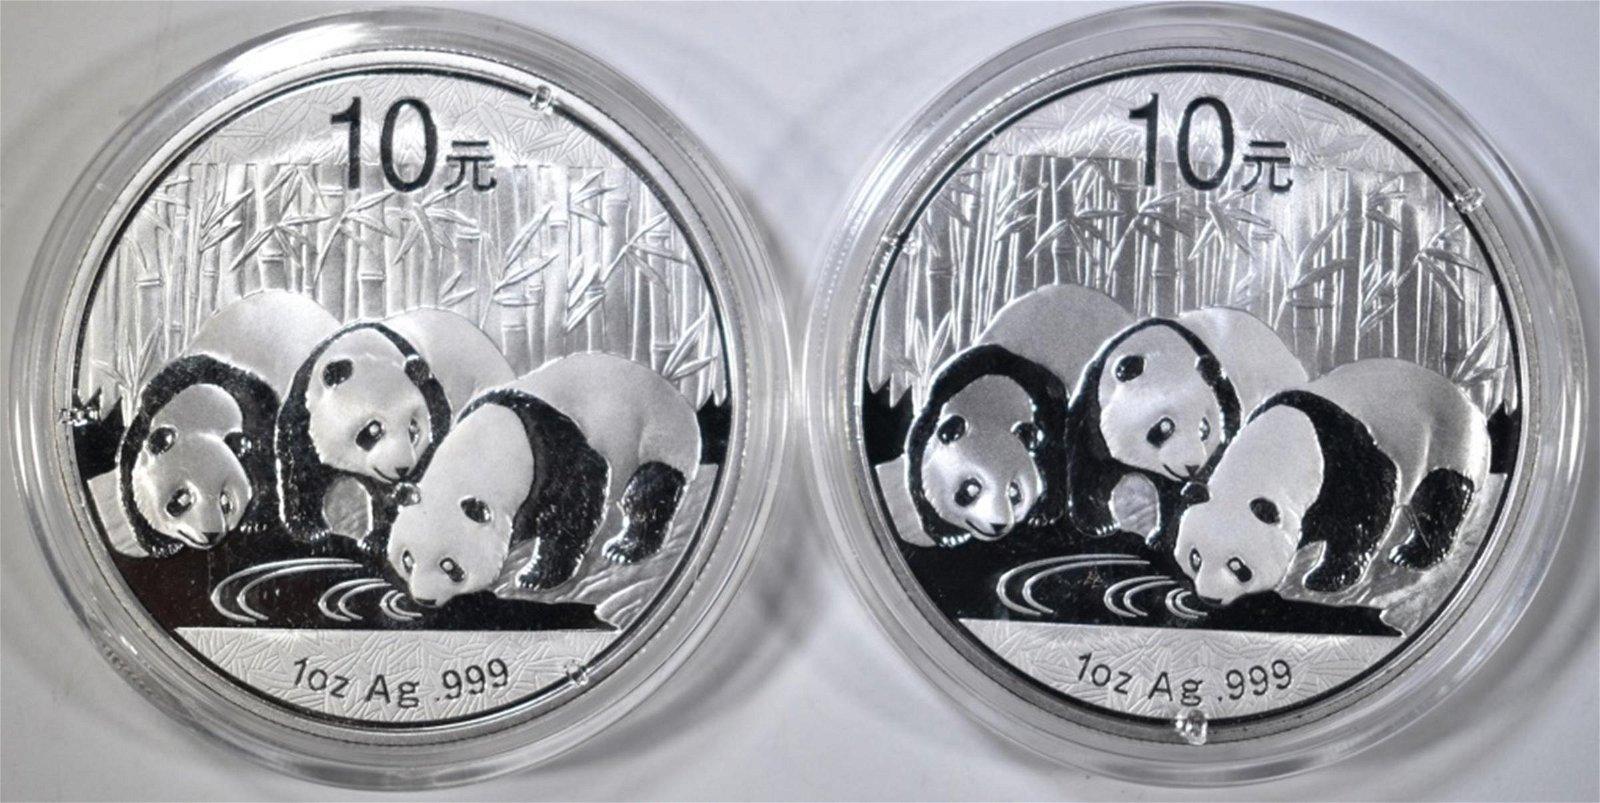 2 2013 10 YUAN CHINESE PANDAS